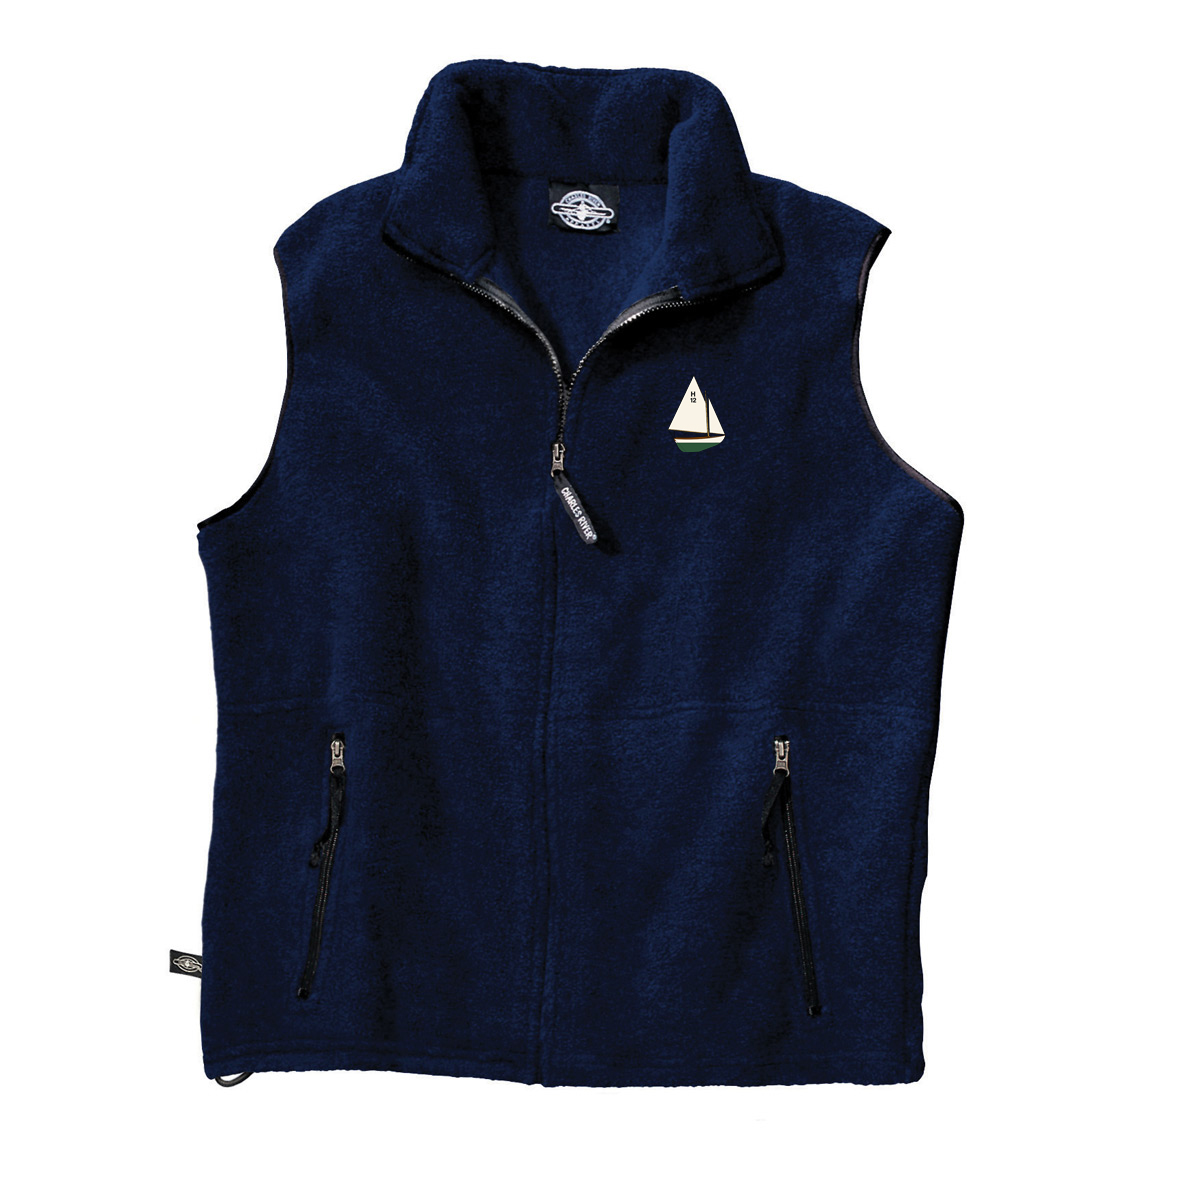 H-Class - Youth Fleece Vest